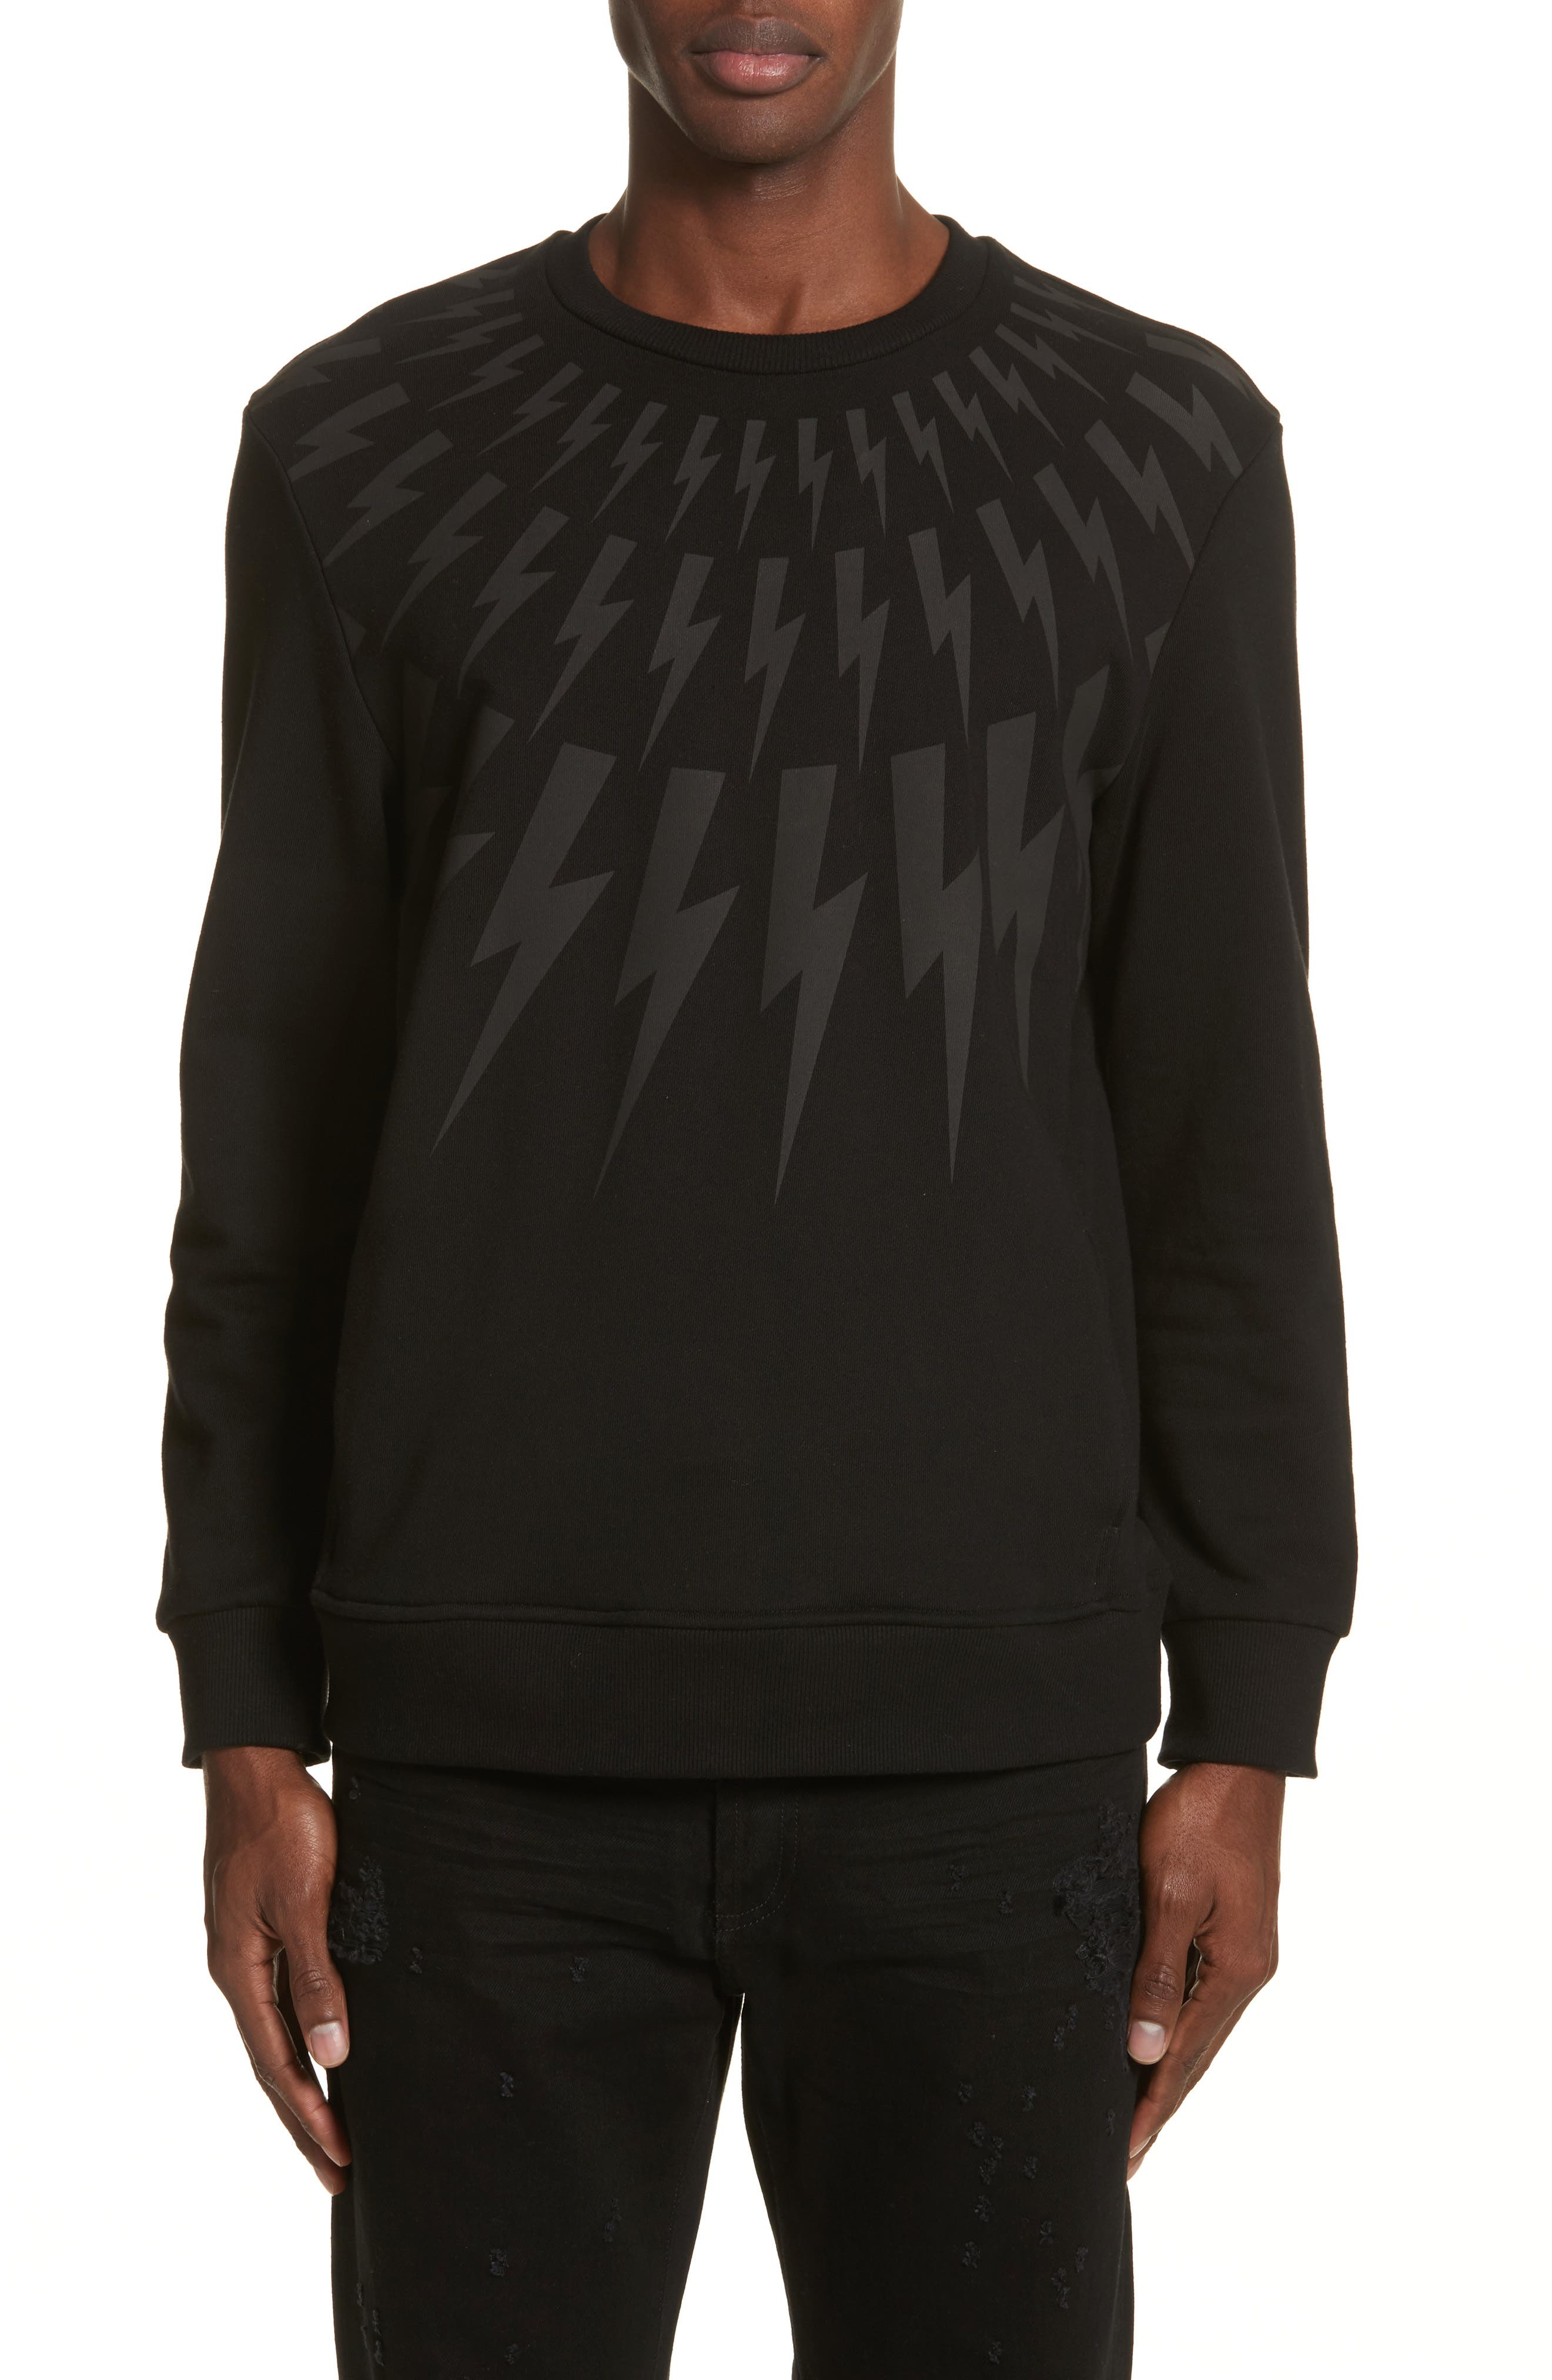 Neil Barrett Fair Isle Lightning Bolt Print Sweatshirt